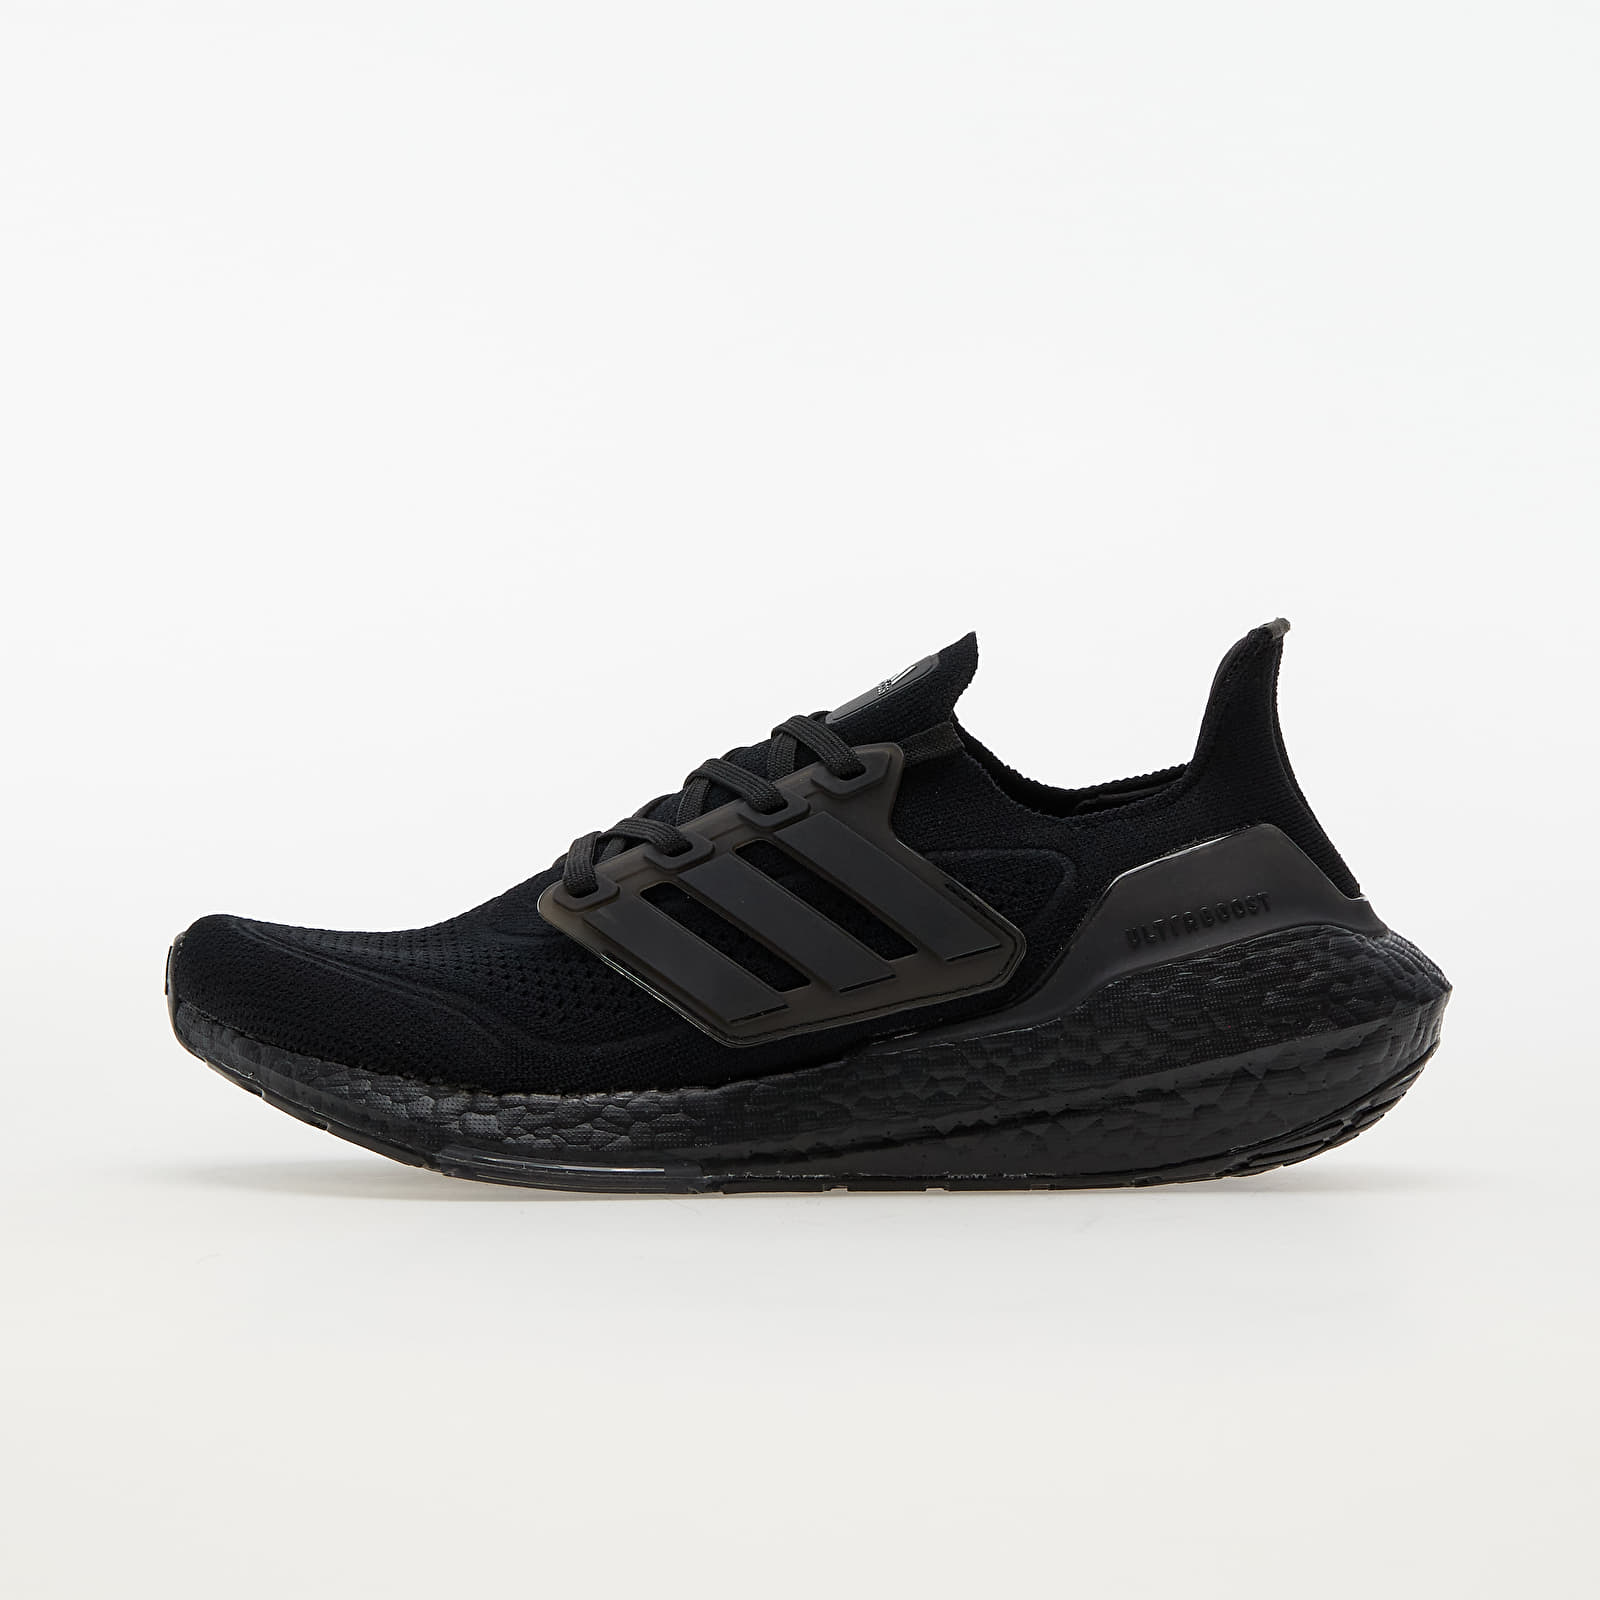 adidas UltraBOOST 21 W Core Black/ Core Black/ Core Black FZ2762